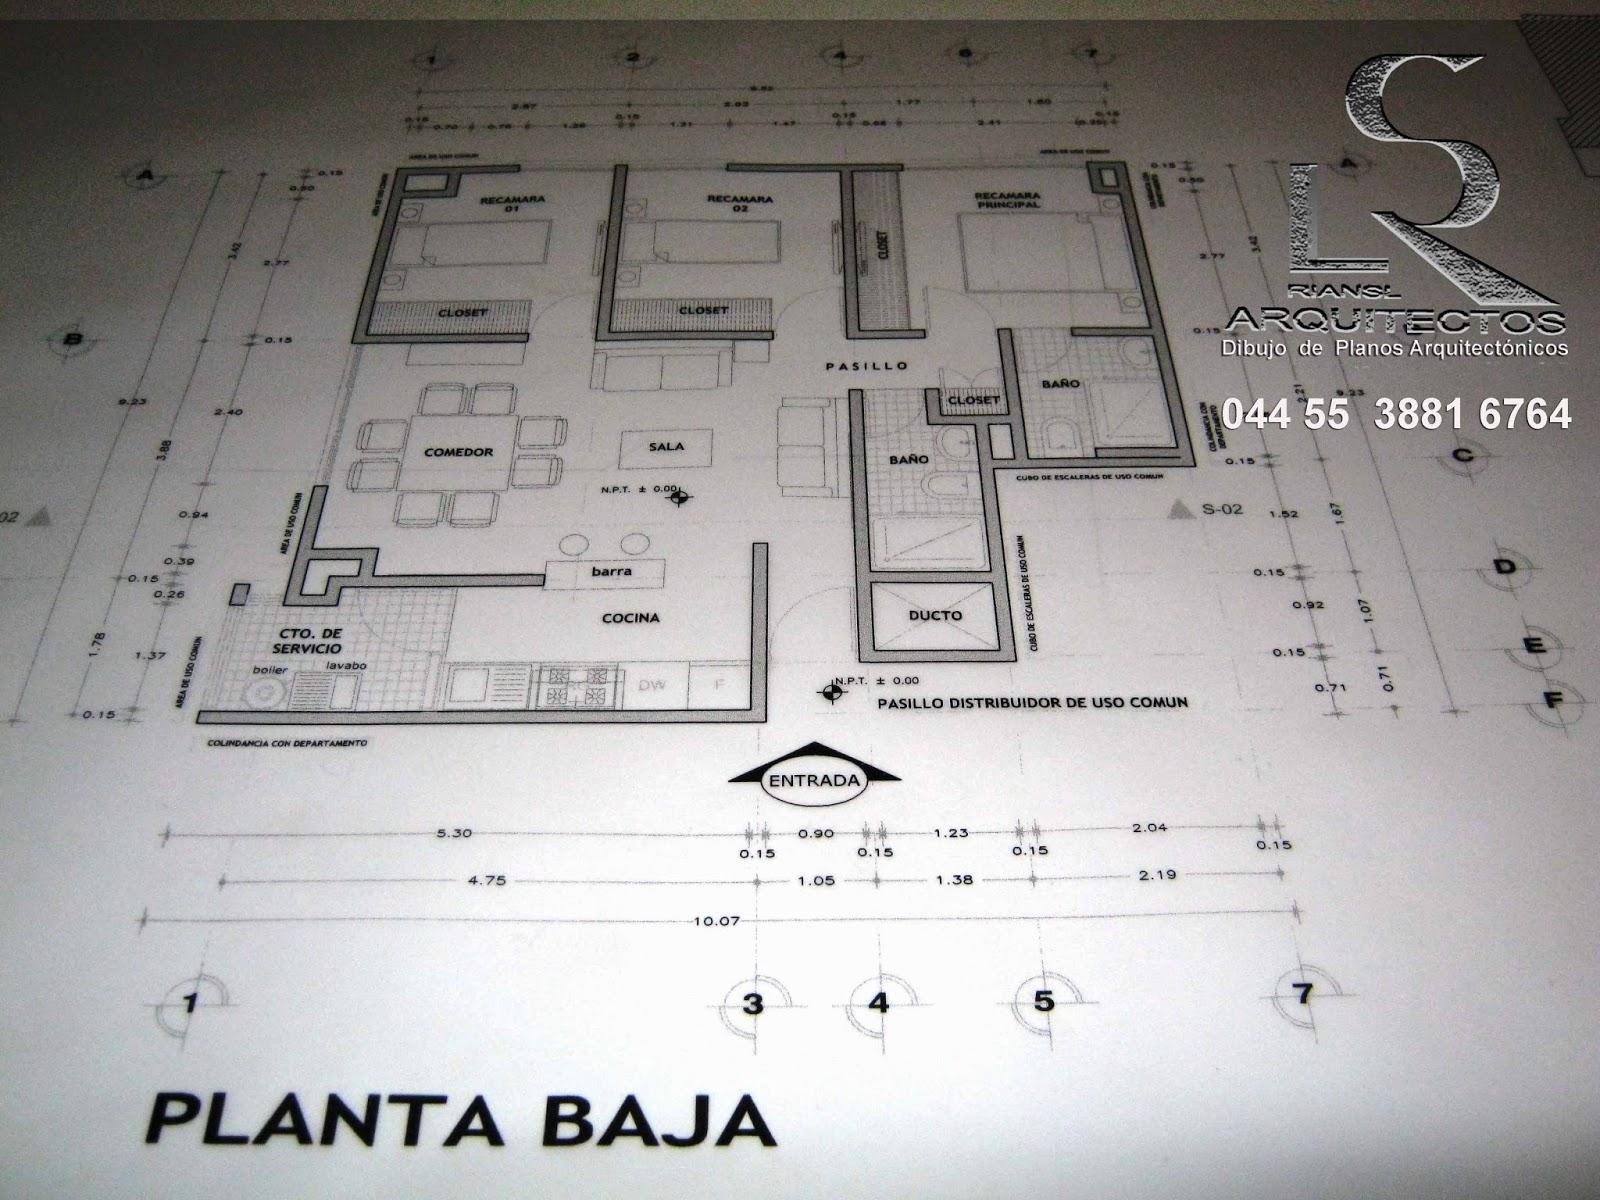 Arq rigoberto s nchez especialista en dibujo de planos for Planos de casa habitacion